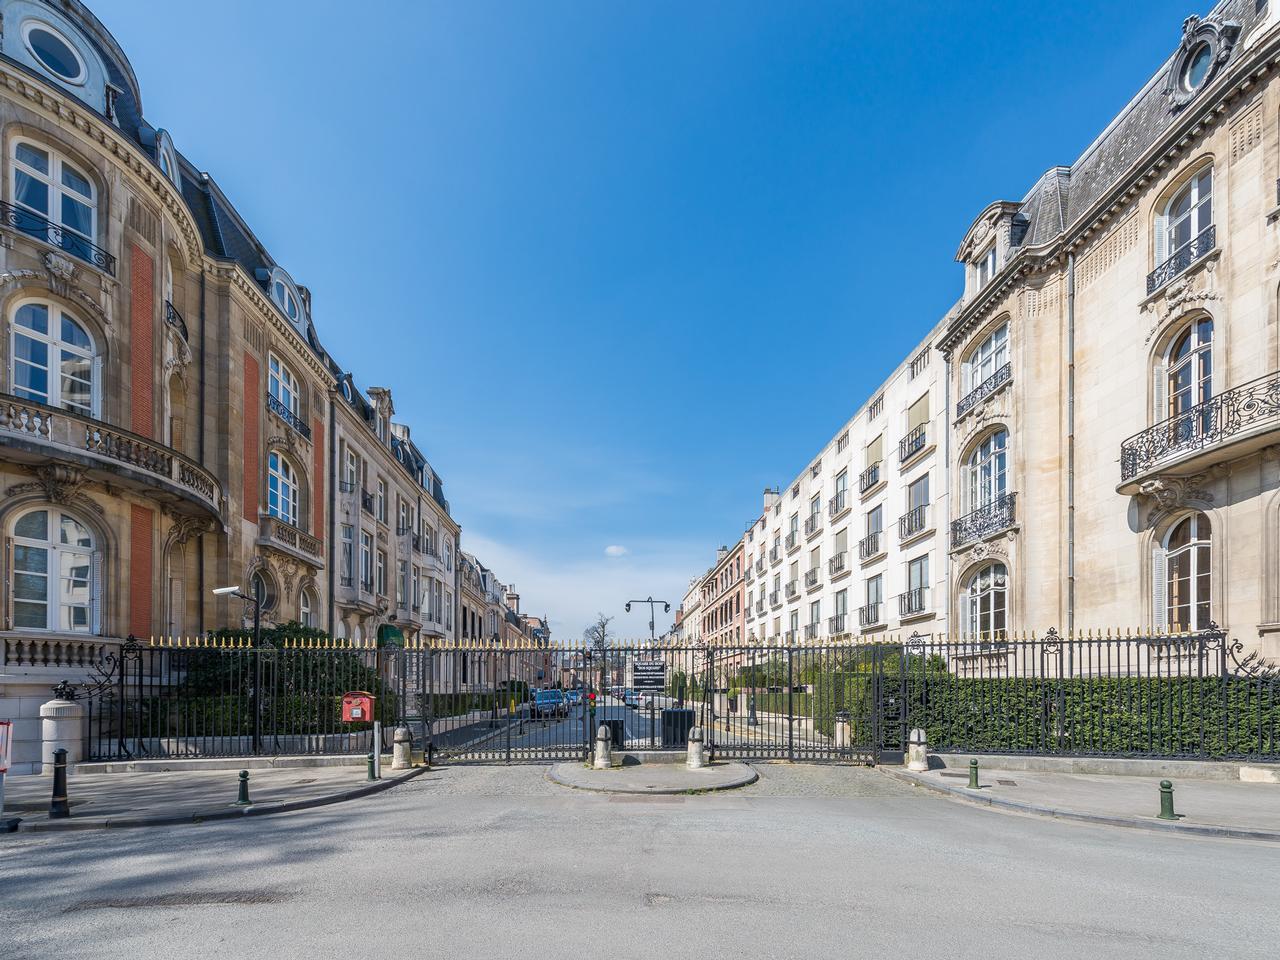 Apartment for Sale at Ixelles I Square du bois Brussels, Brussels, 1000 Belgium